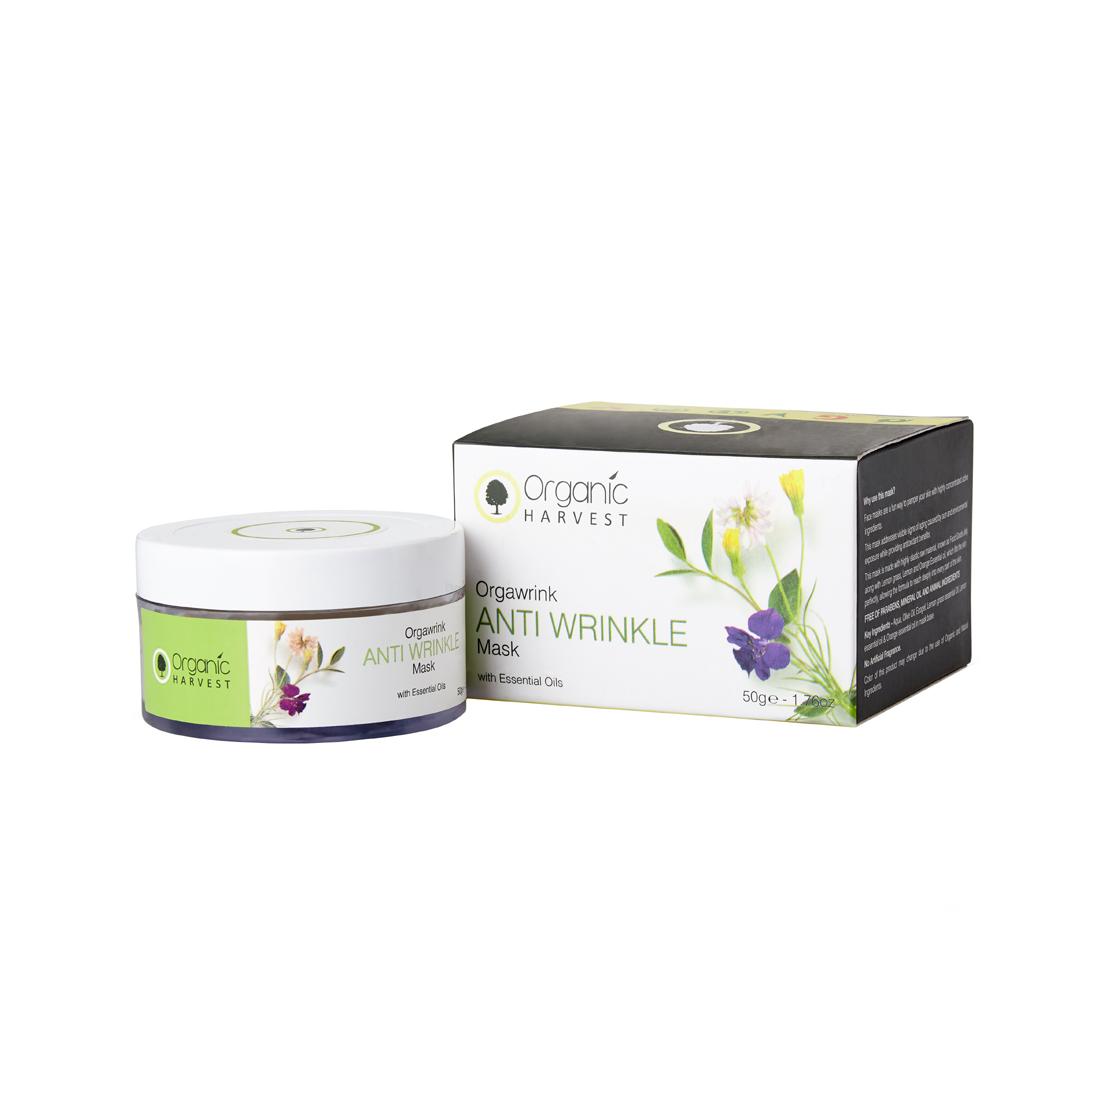 Organic Harvest | Anti Wrinkle Mask - 50g